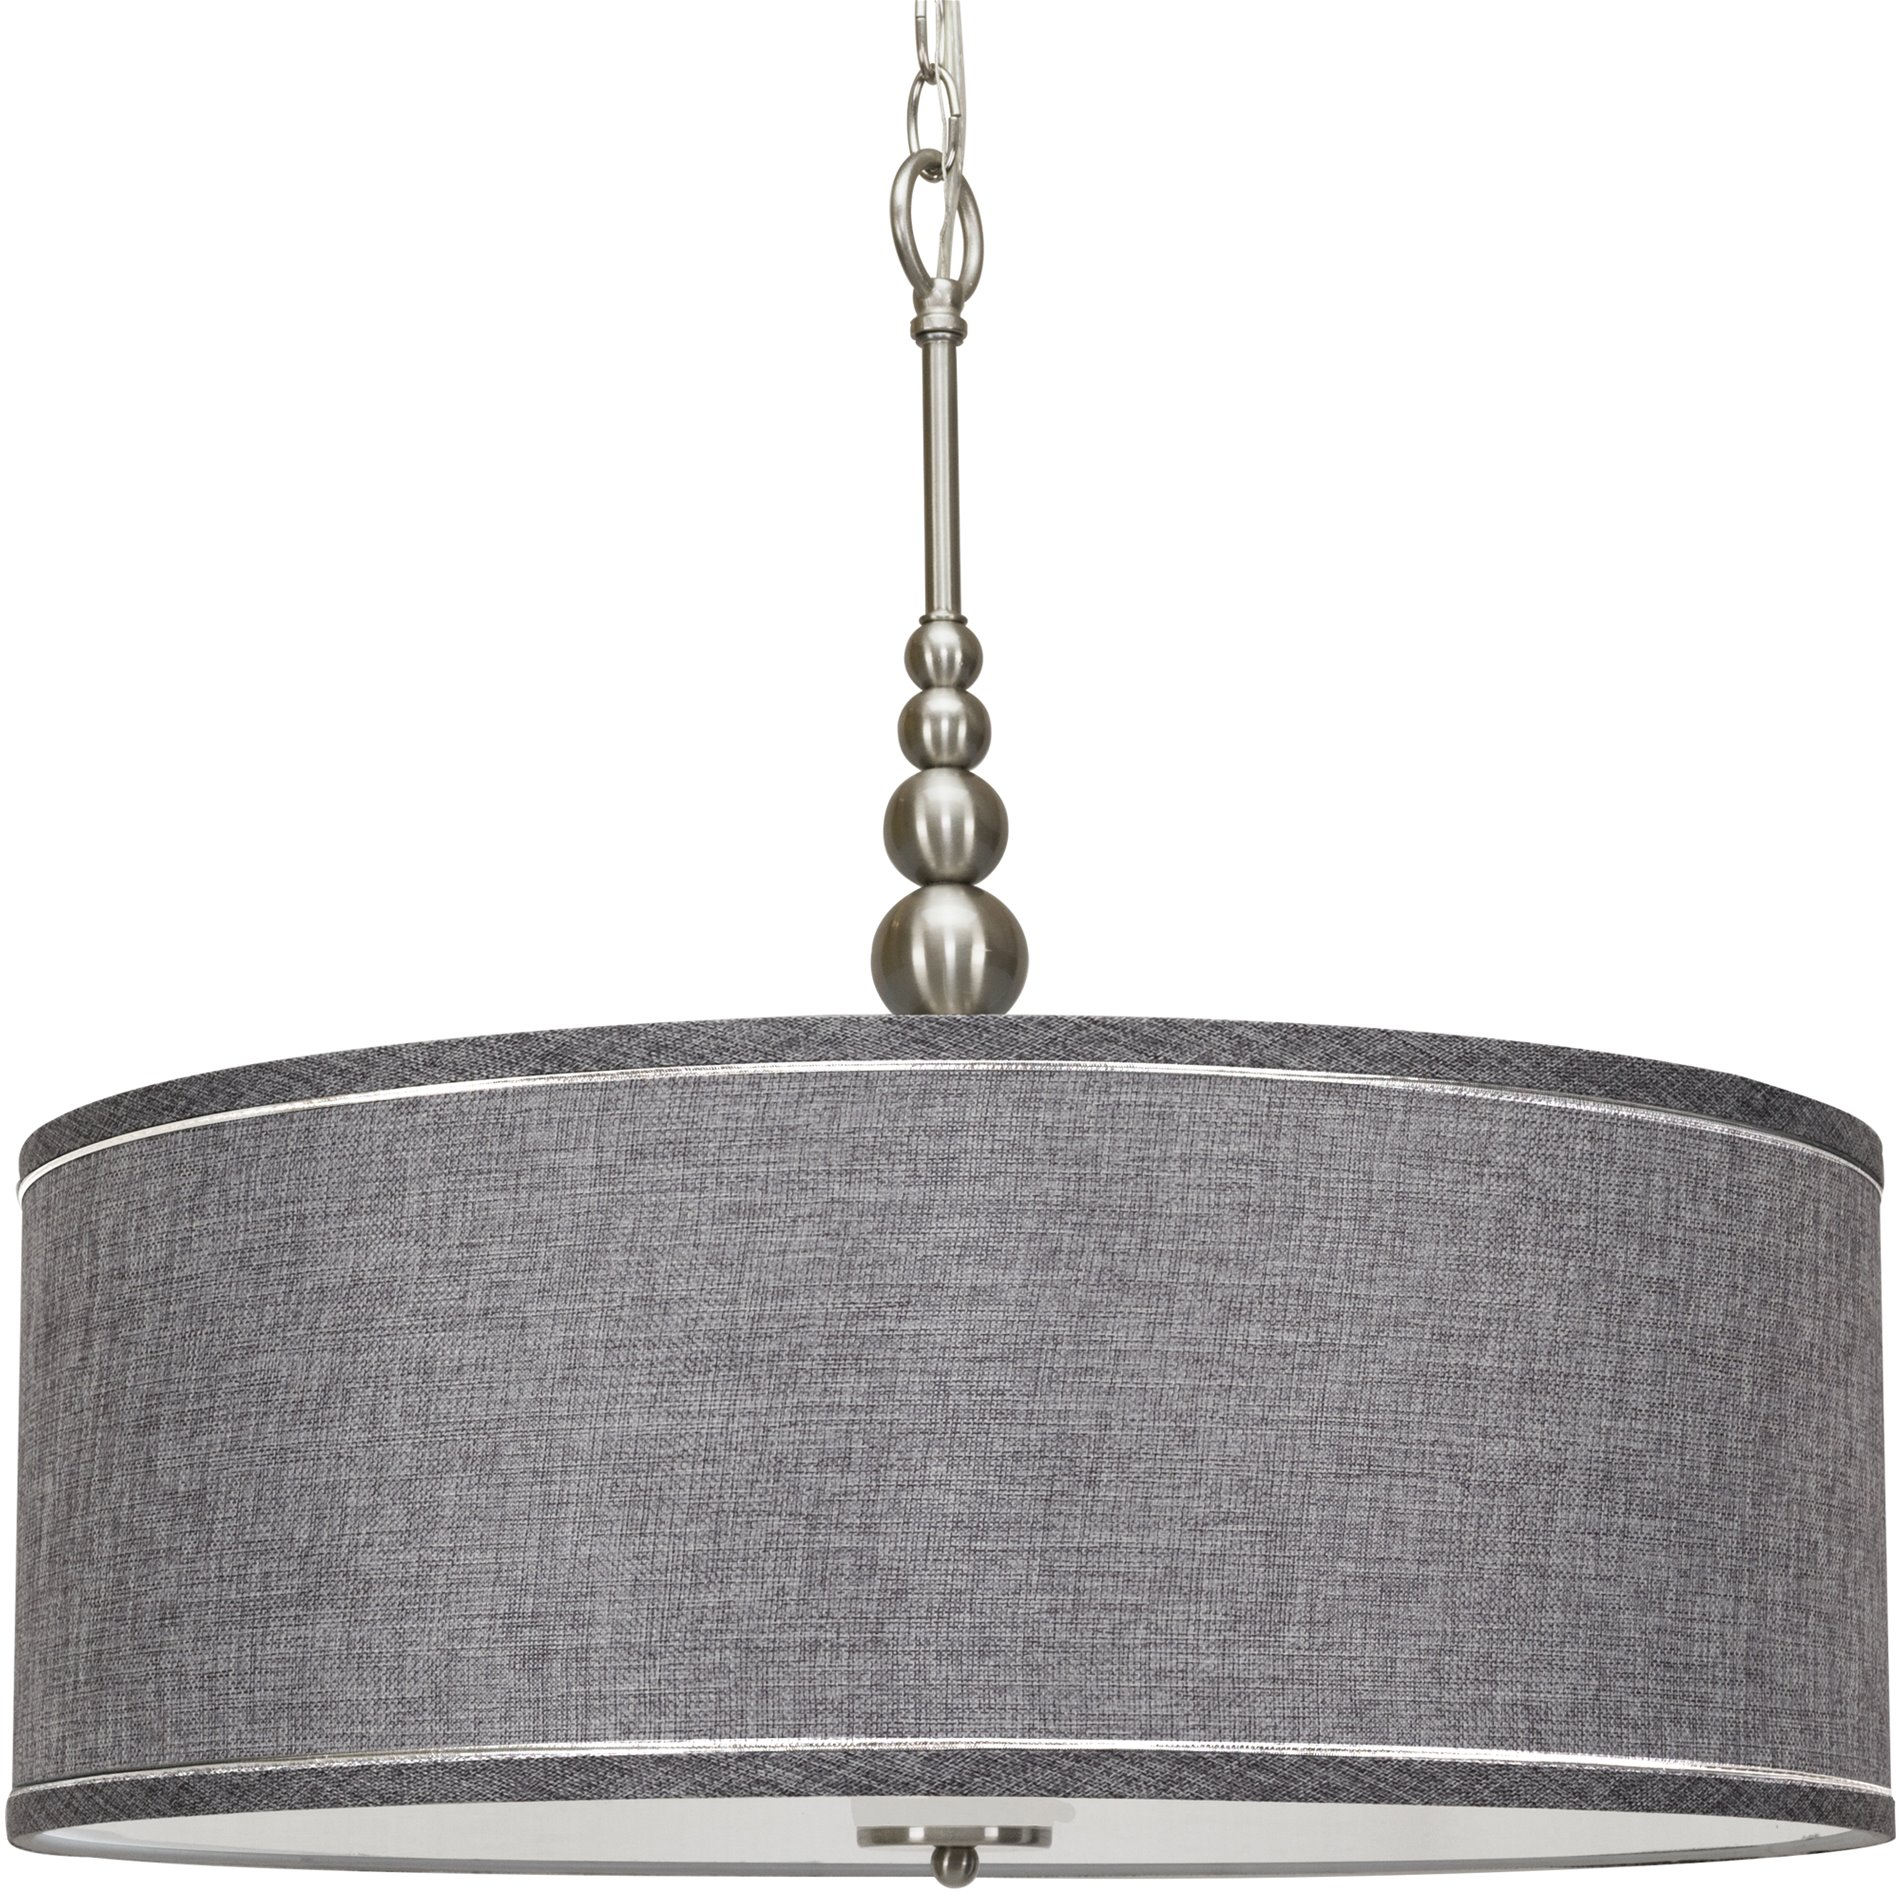 Image of: Kira Home Adelade 22 Drum Pendant Chandelier Gray Fabric Shade Glass Diffuser Adjustable Height Brushed Nickel Walmart Com Walmart Com